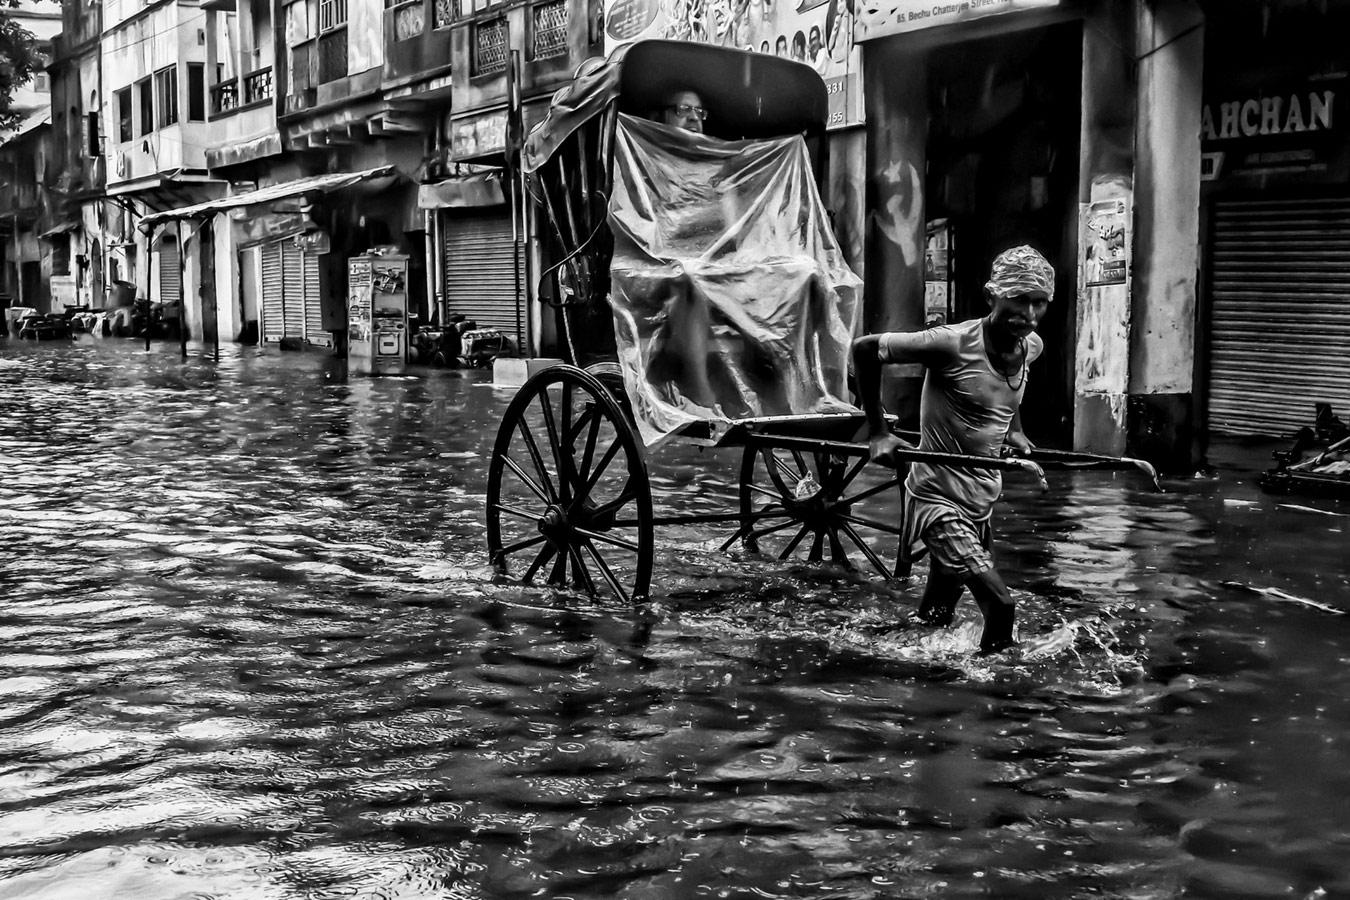 Дебарши Мукерджи / Debarshi Mukherjee, Фотоконкурс RMetS / RPS Weather